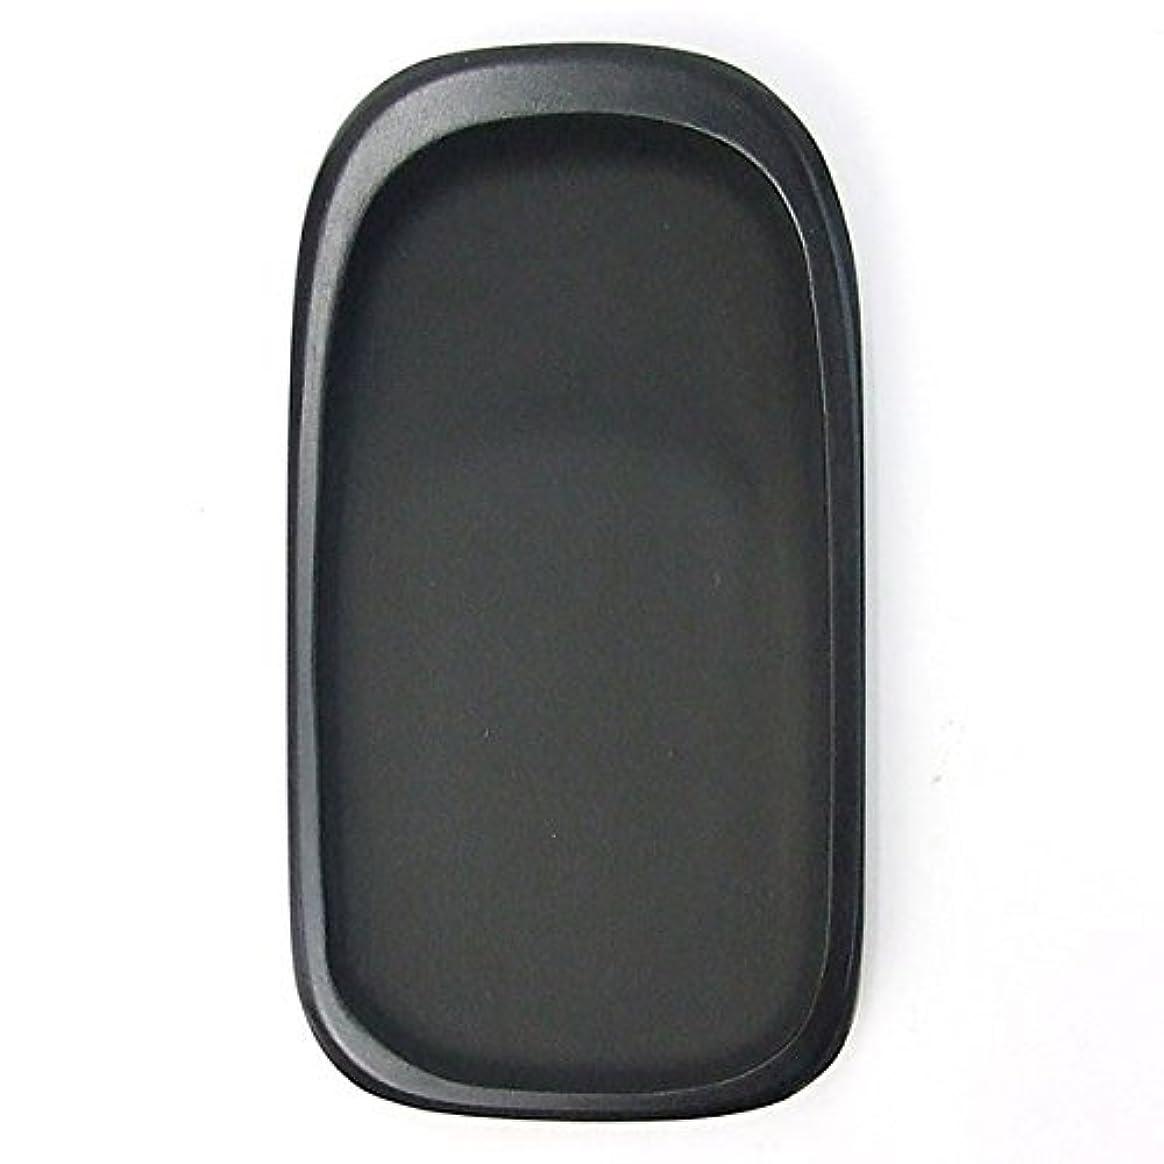 アパル前兆長椅子硯石 四五平 天然型硯 (135×73×20mm)